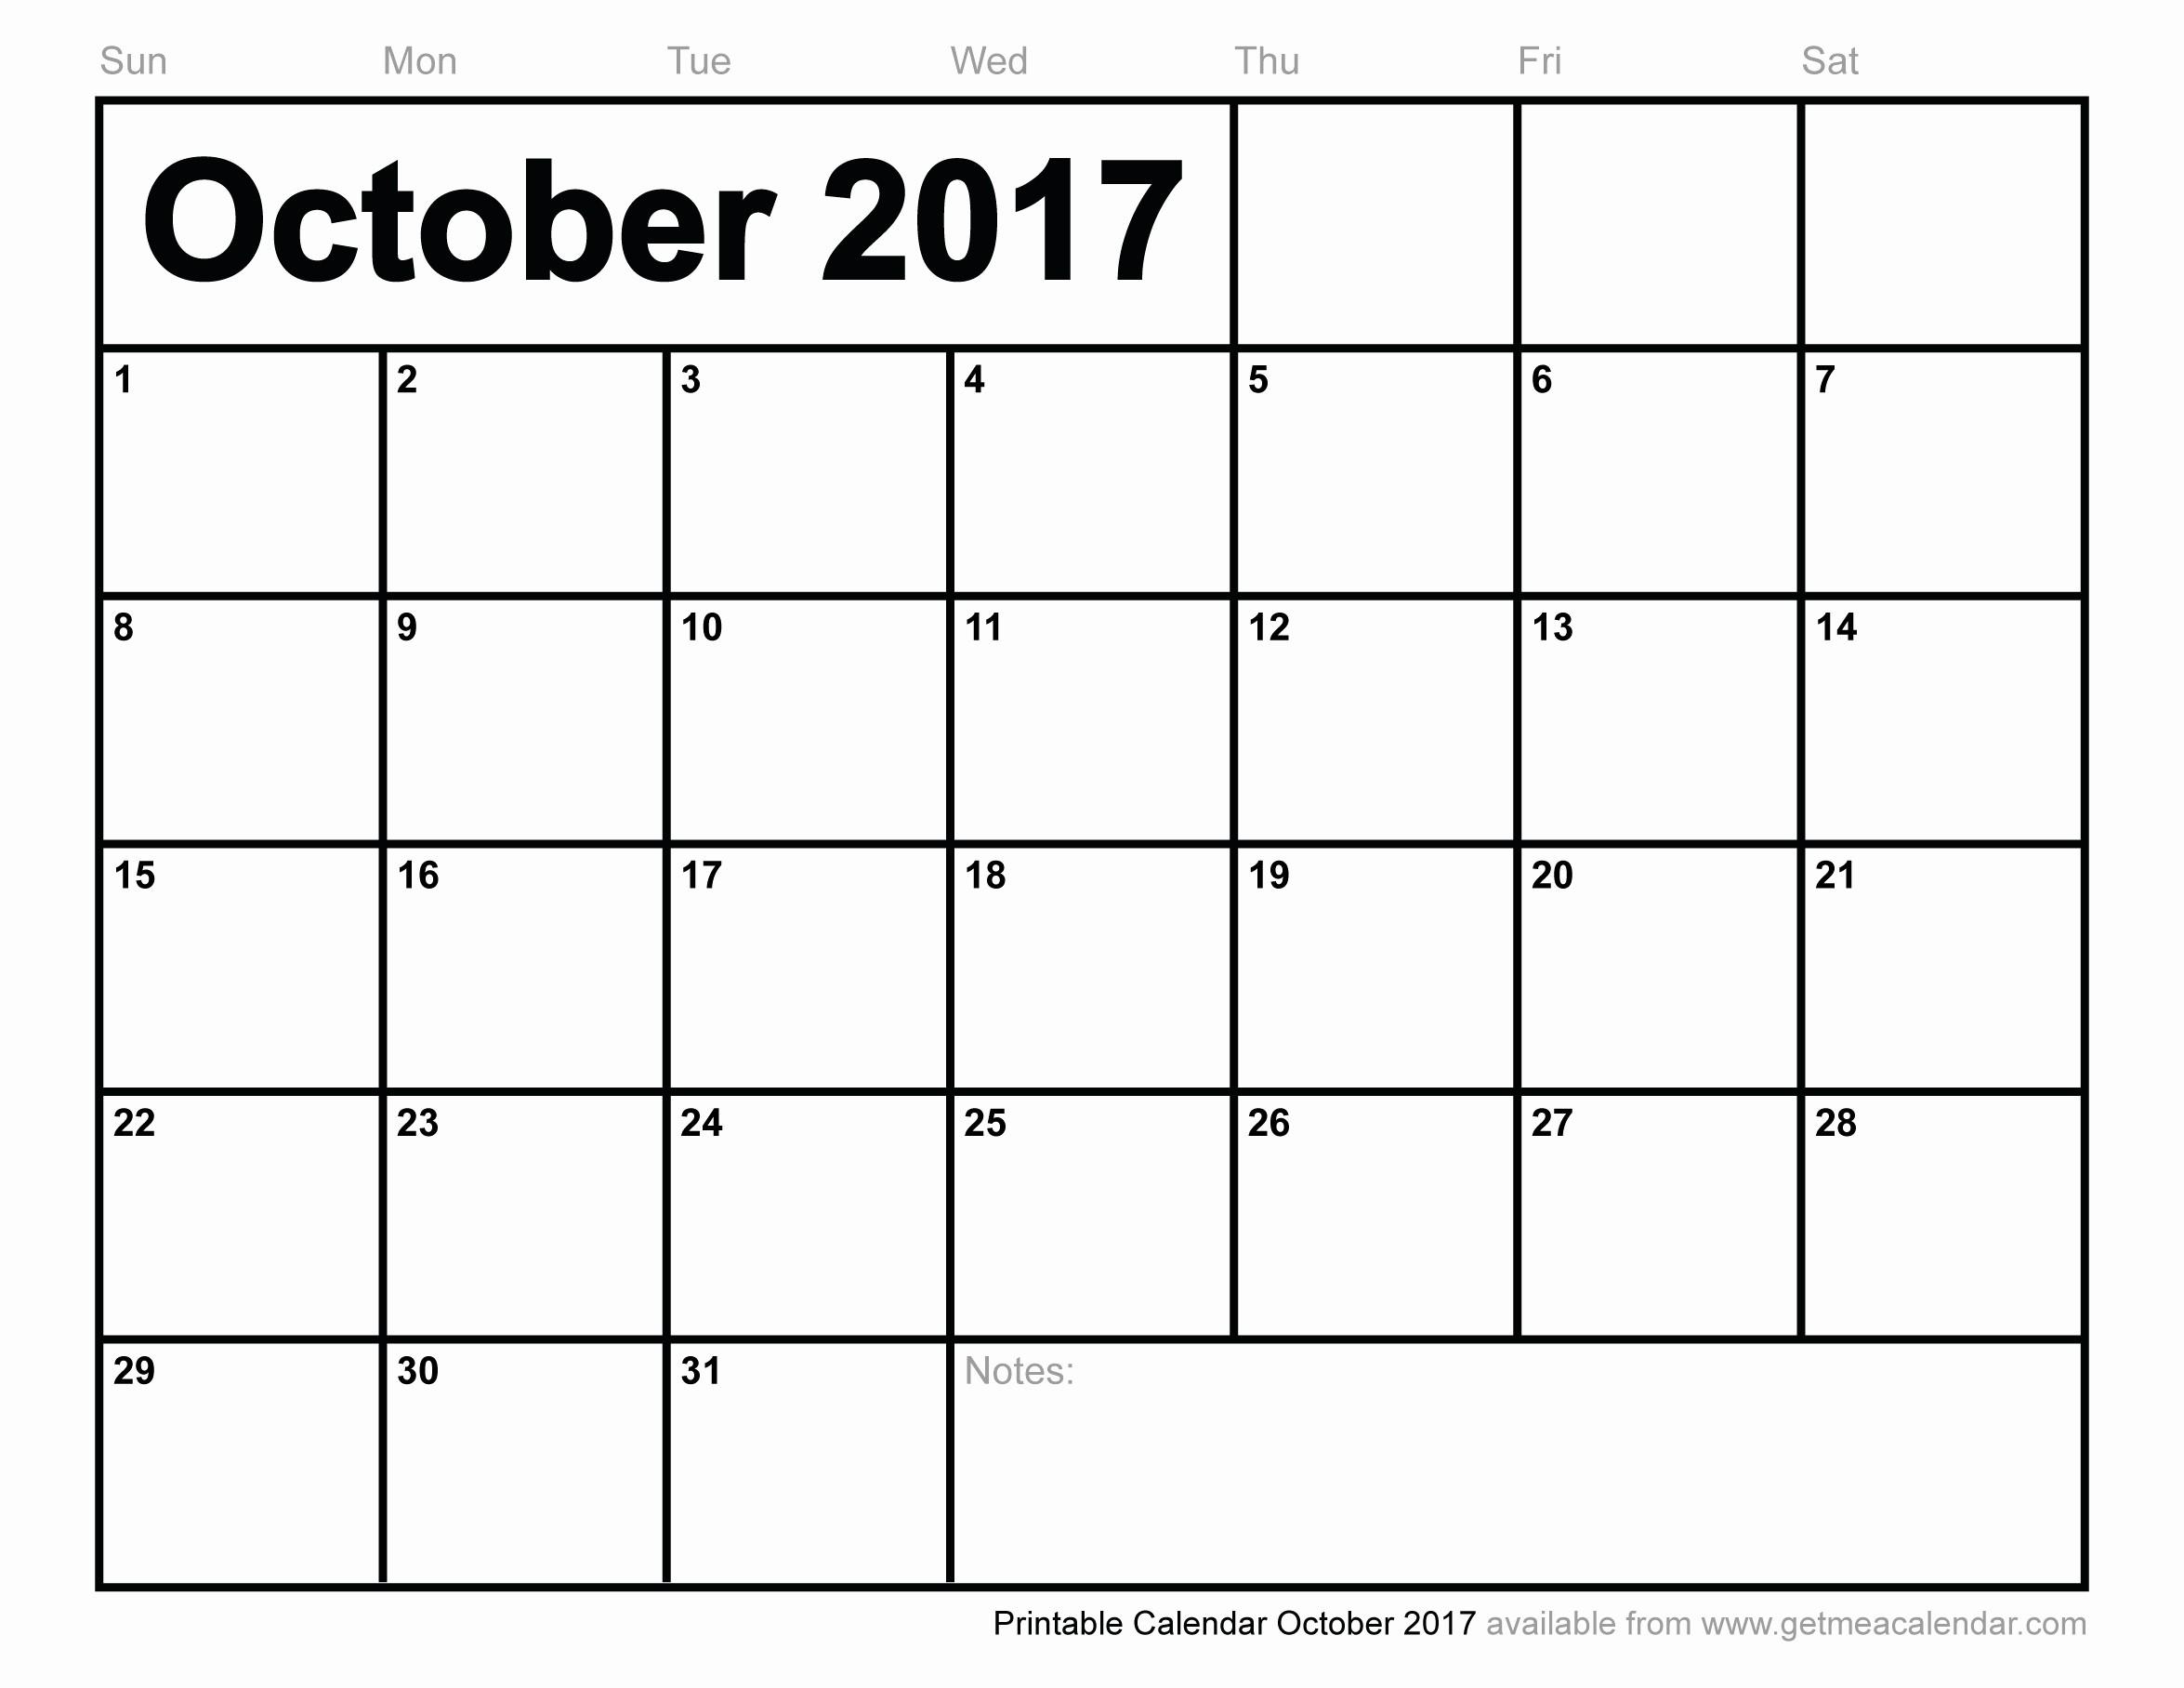 Blank Calendar Template August 2017 Elegant October 2017 Calendar with Holidays Uk